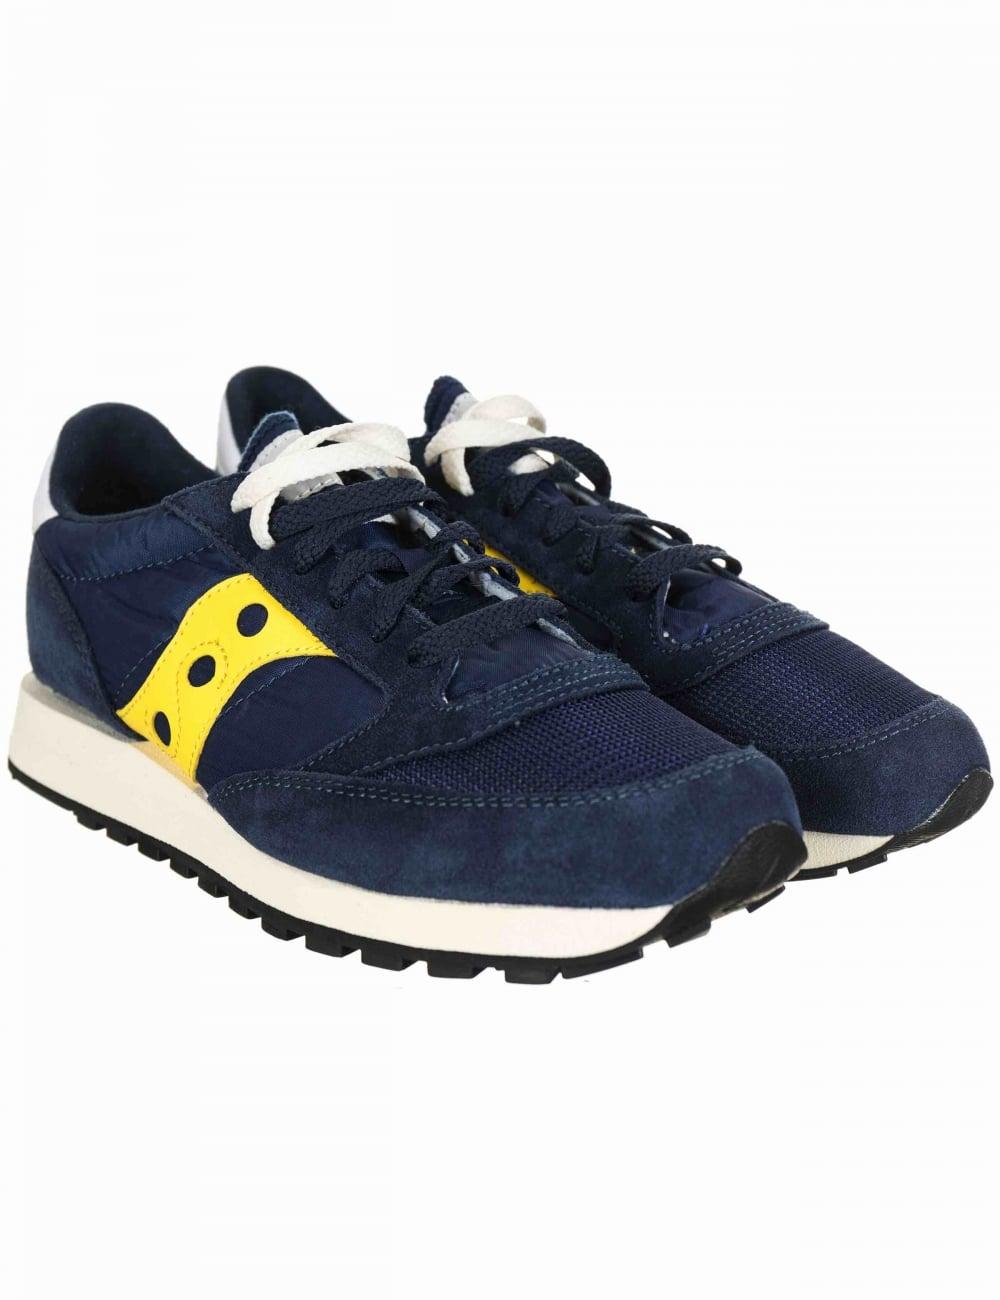 online store fce90 1edab Jazz Original Vintage Shoes - Vintage Blue/Yellow